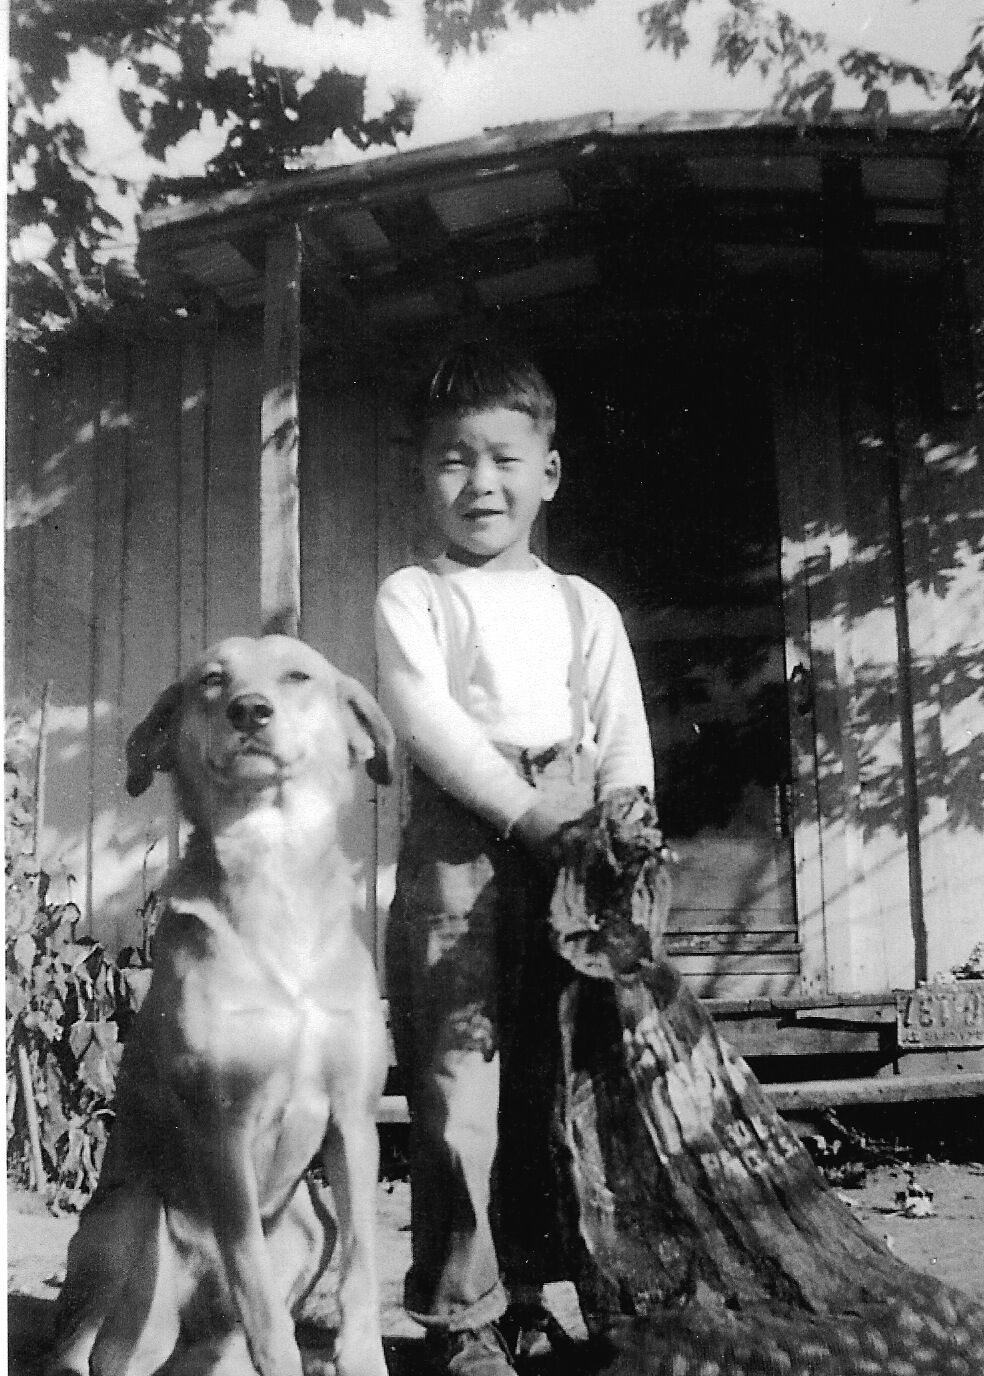 Rod Shingu and his dog. Scott, Arkansas circa 1950